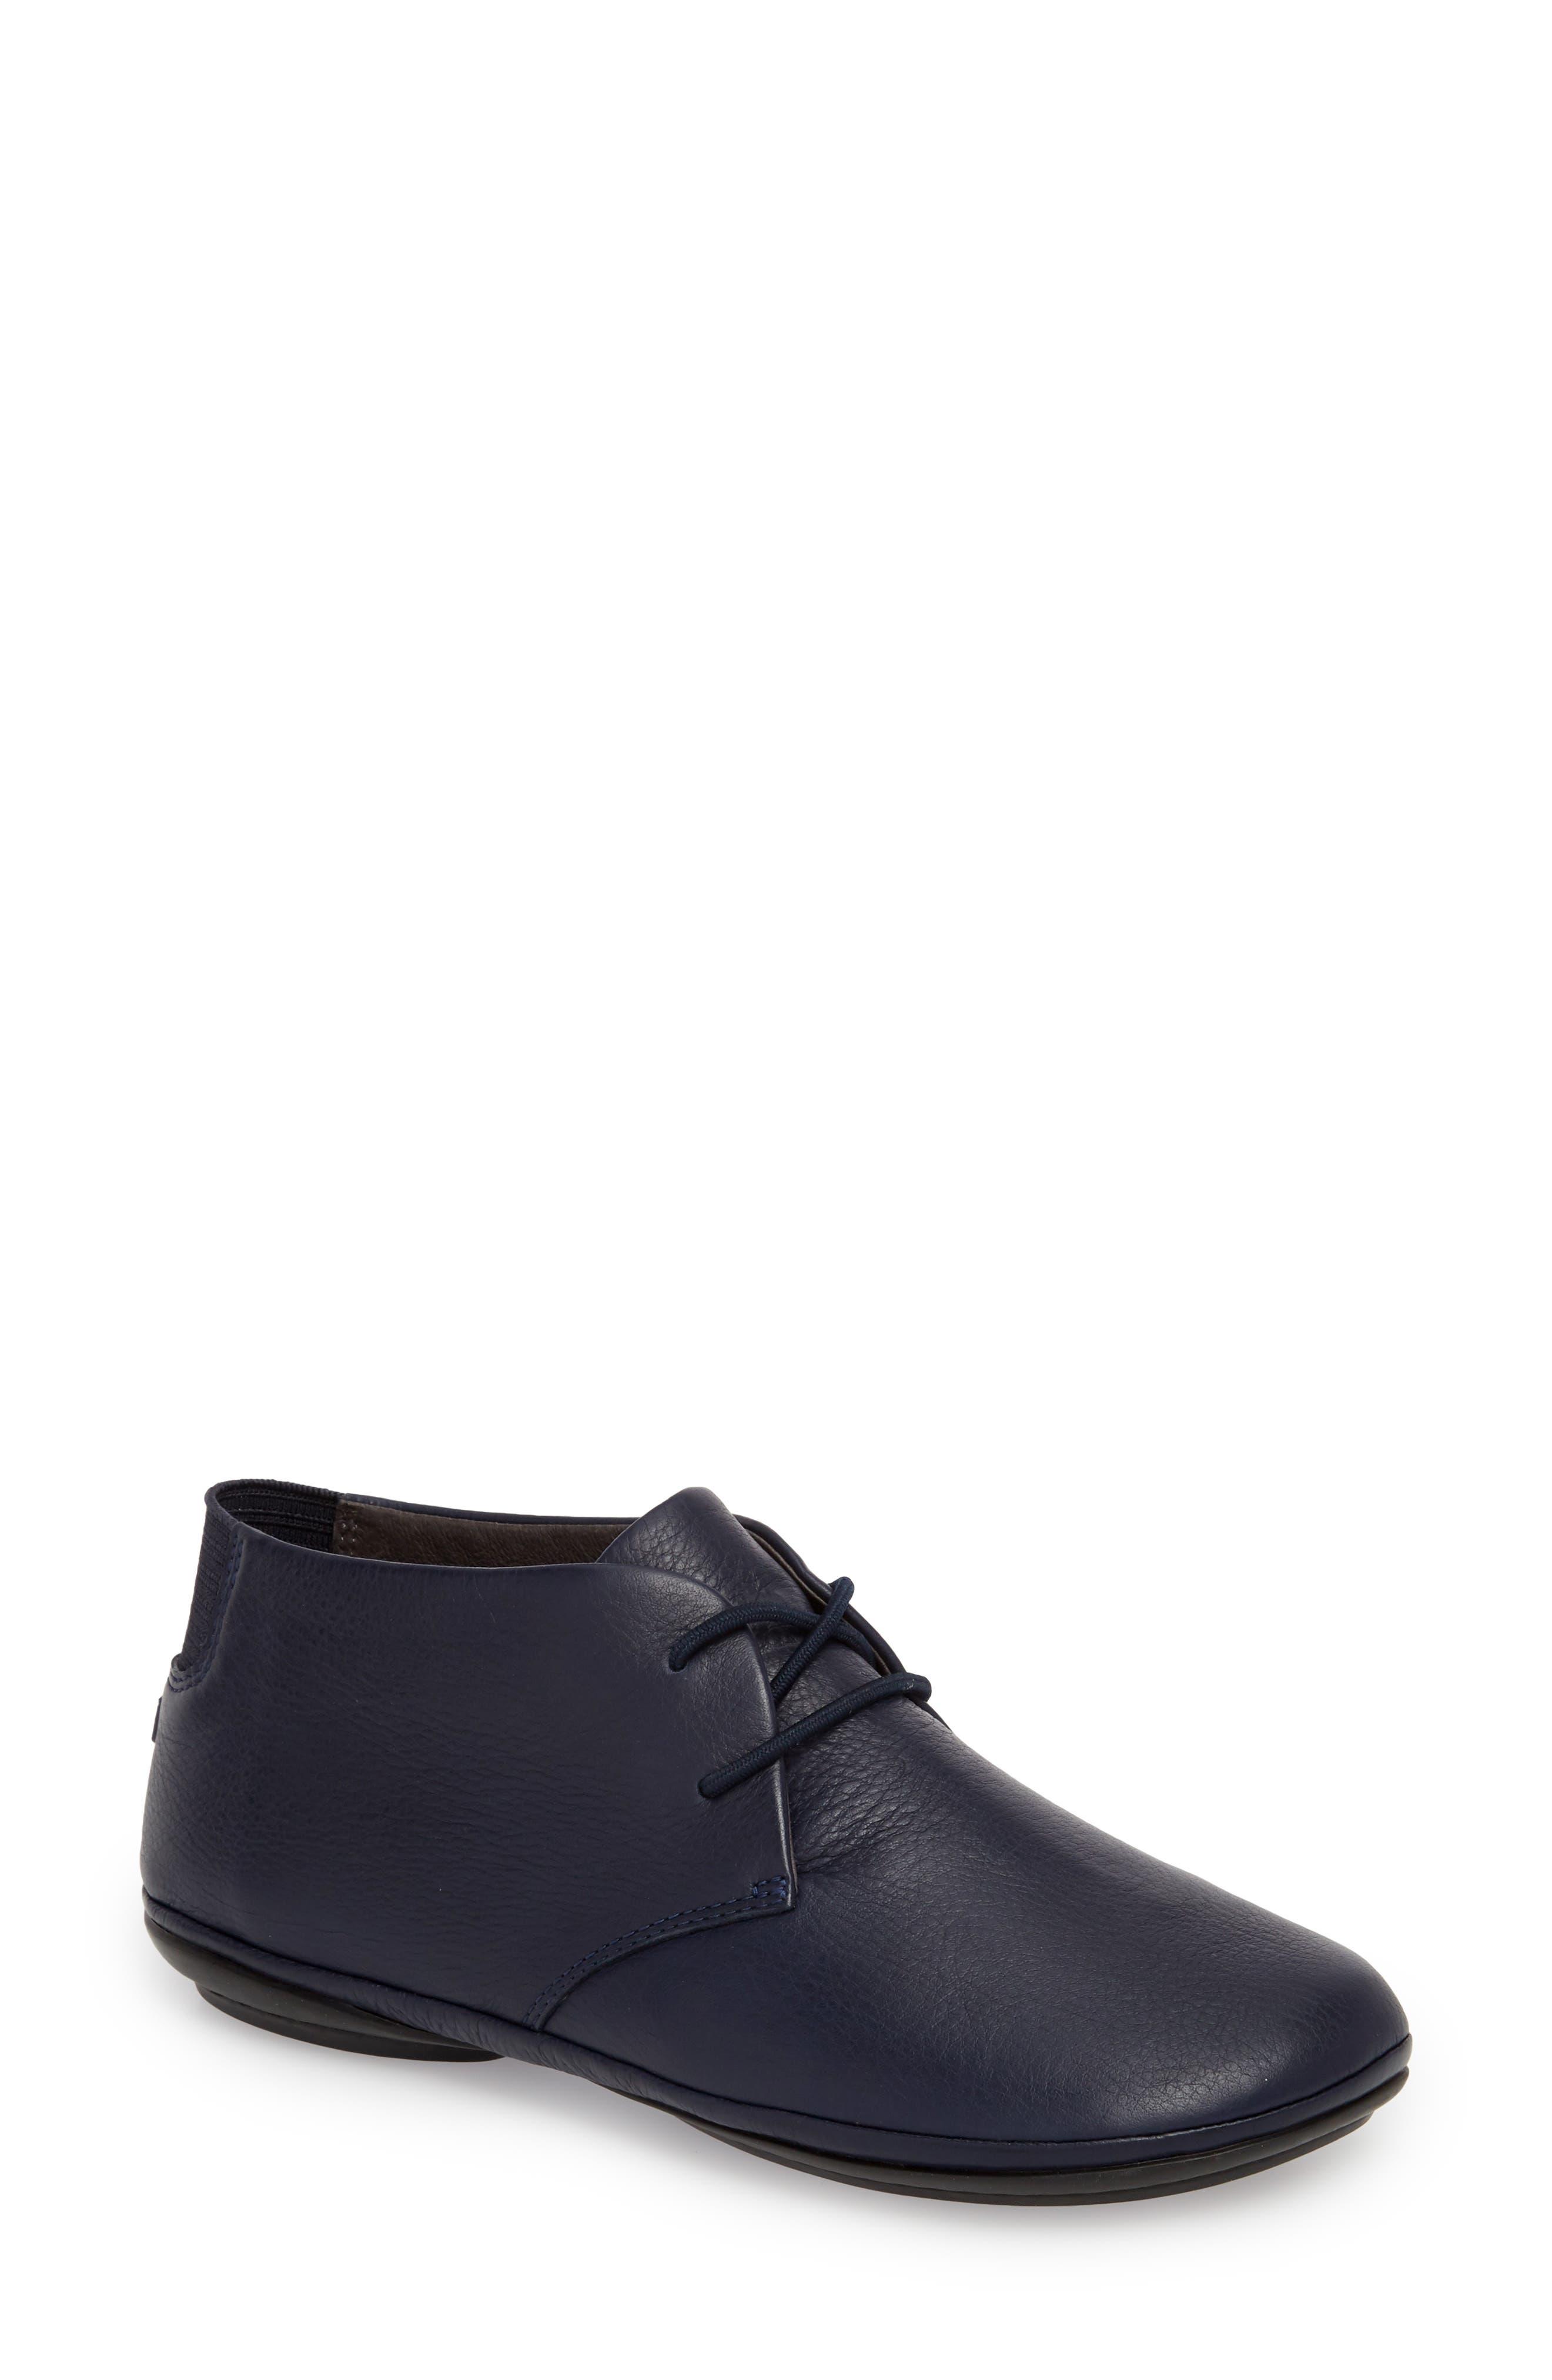 Right Nina Desert Boot, Navy Leather